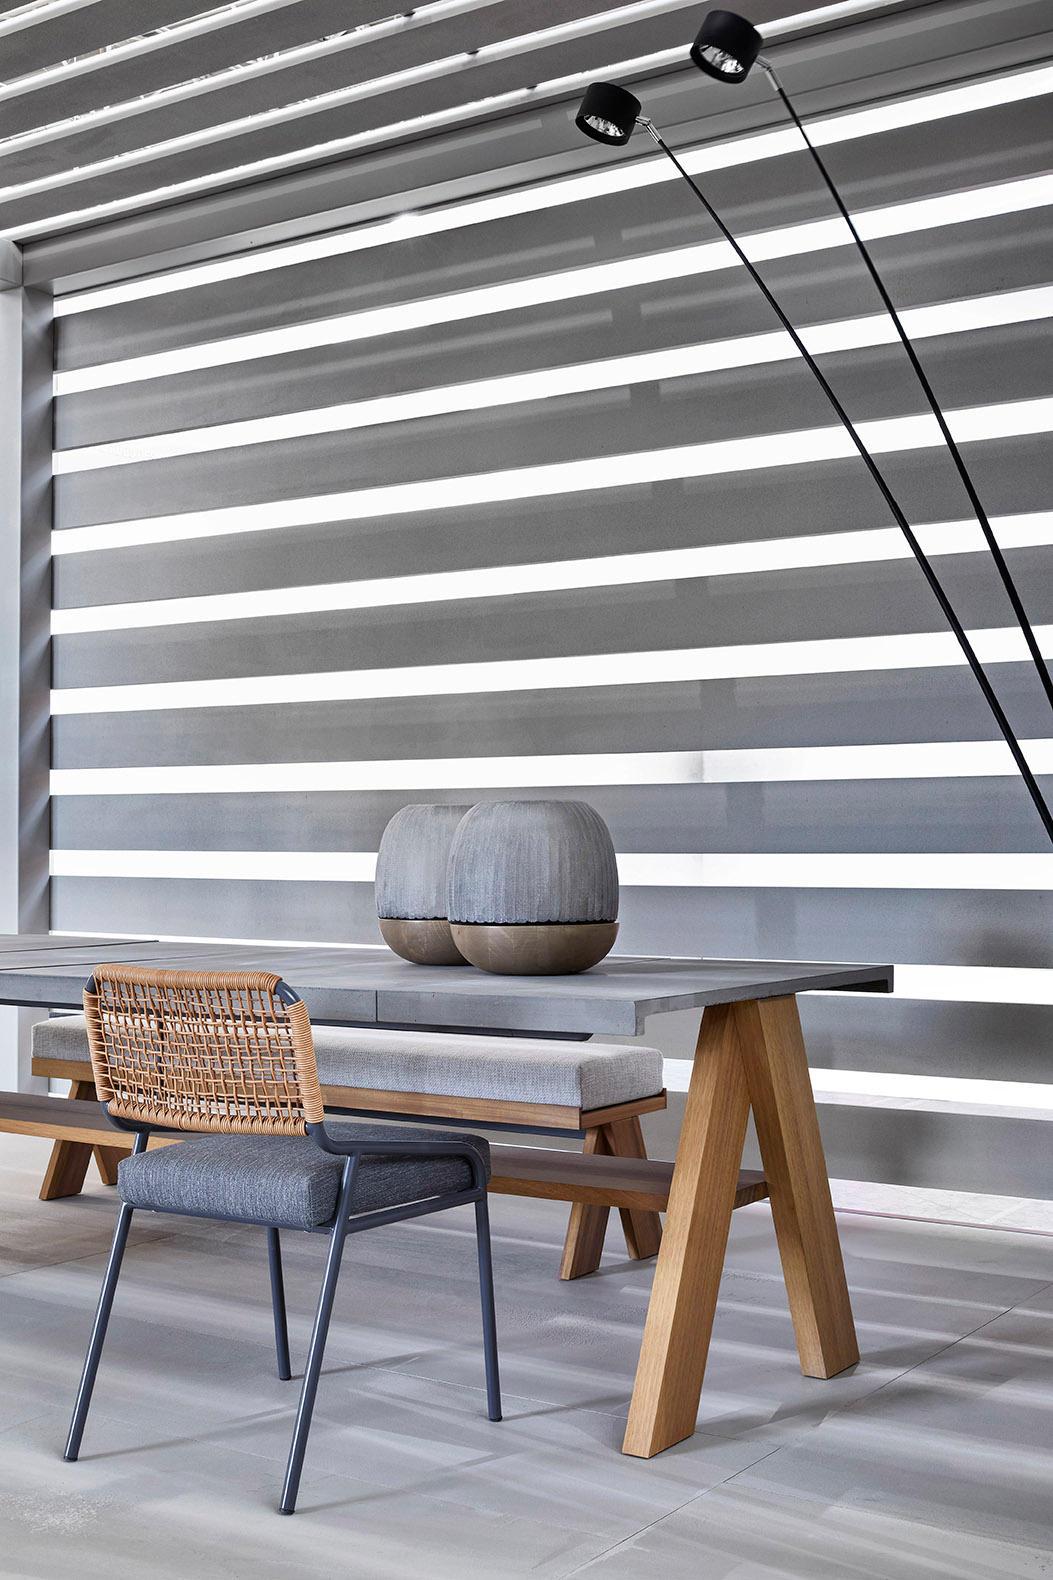 Blend tai silla sillas para restaurantes de meridiani for Catalogo meridiani